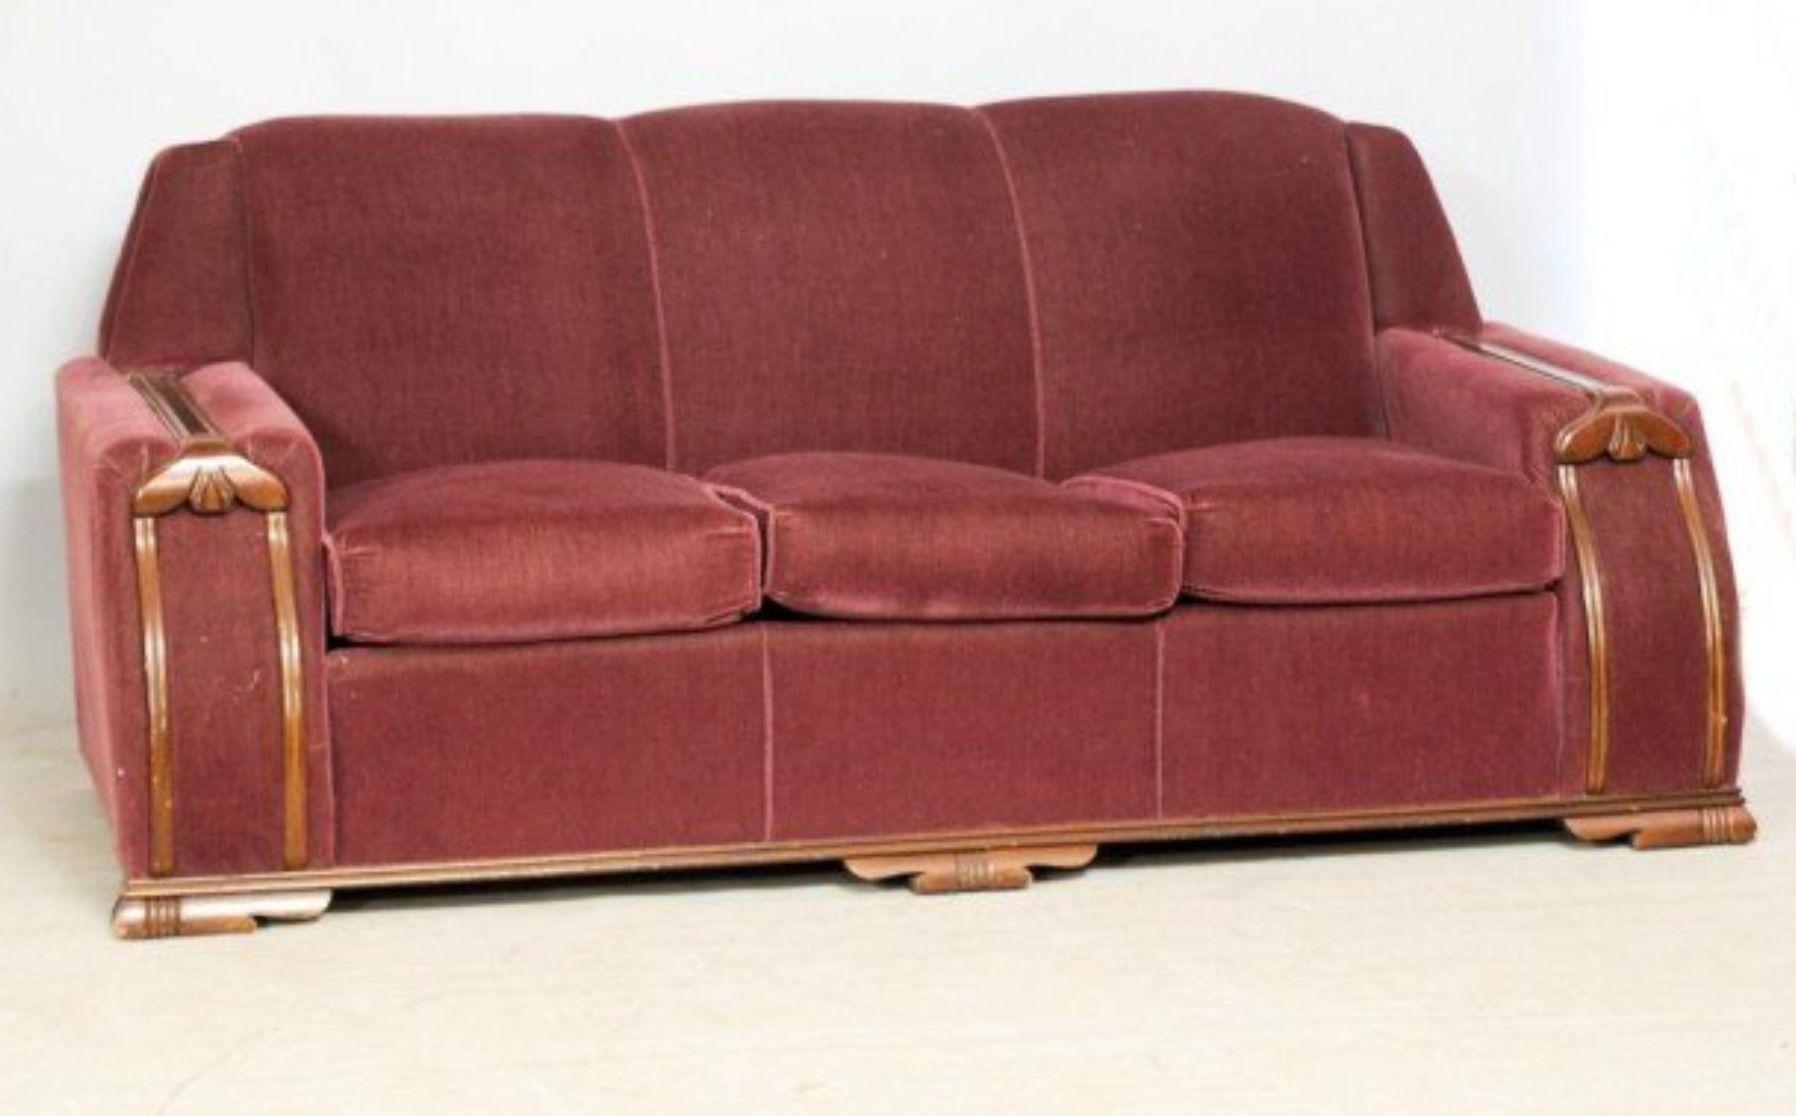 vintage art deco furniture. Deco Sofa, See The Matching Chair Photo. Vintage SofaFurniture VintageArt Art Furniture 1